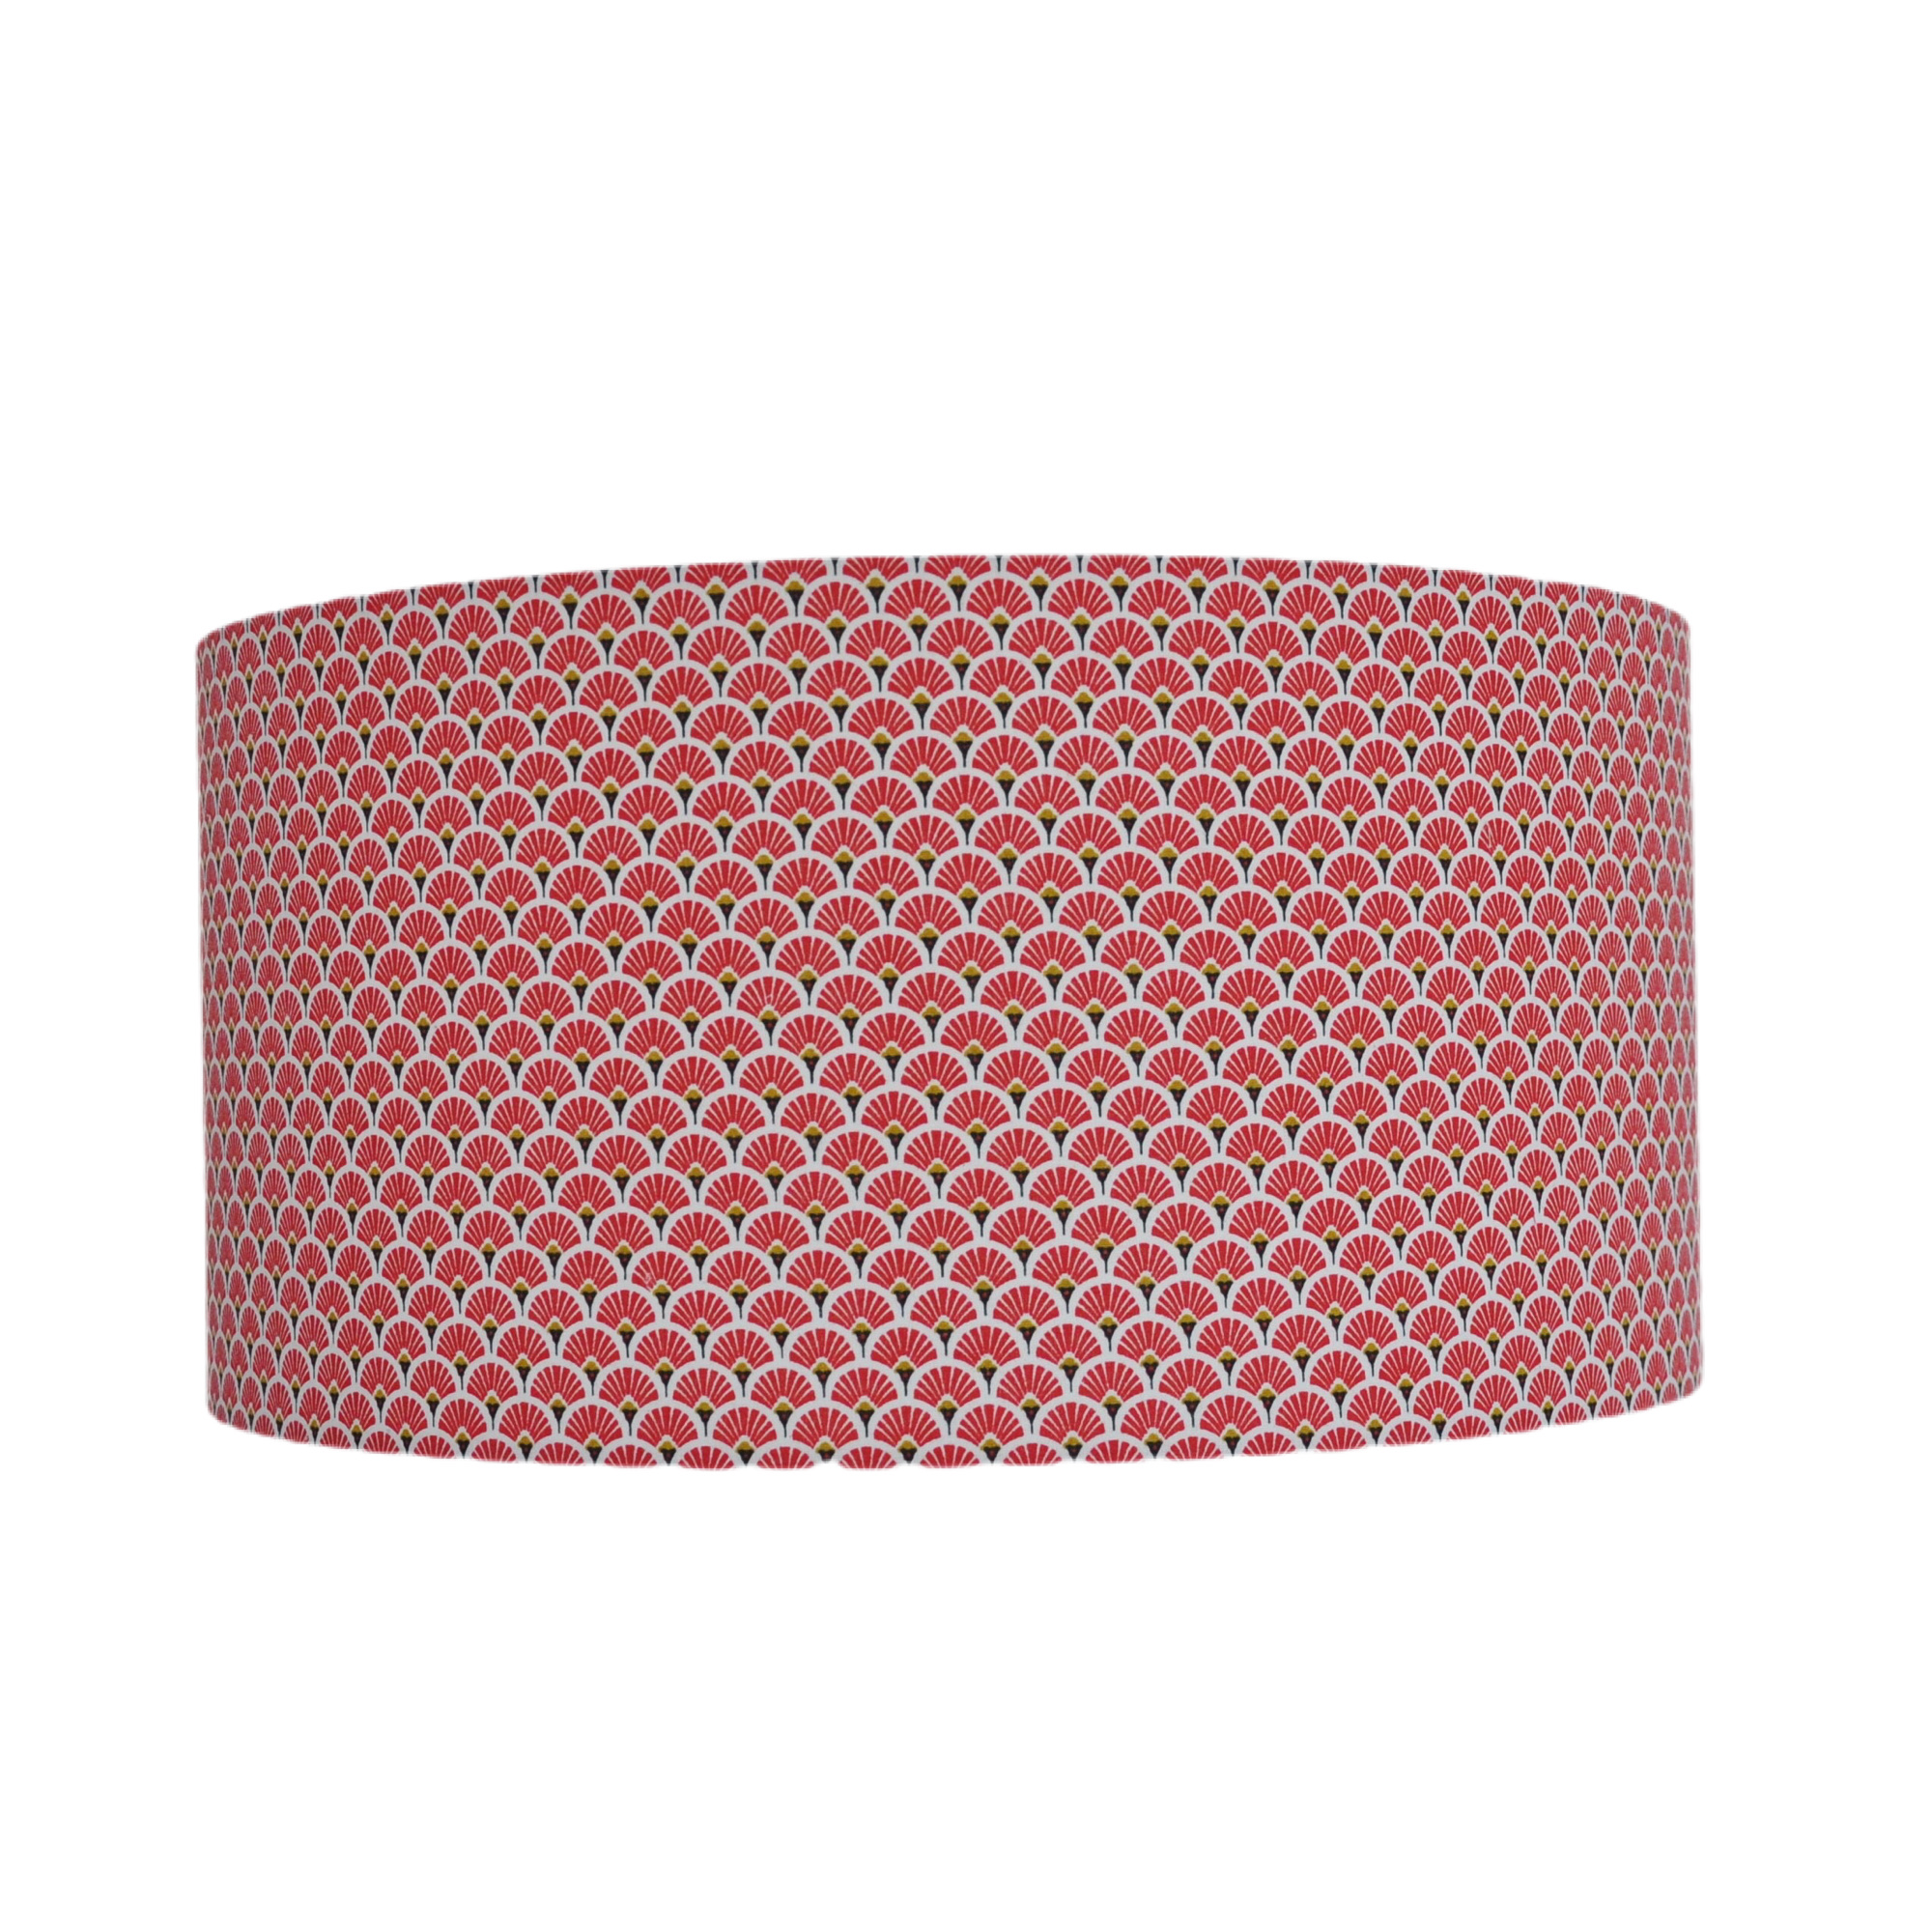 Suspension eventail rouge et or diamètre 25 cm